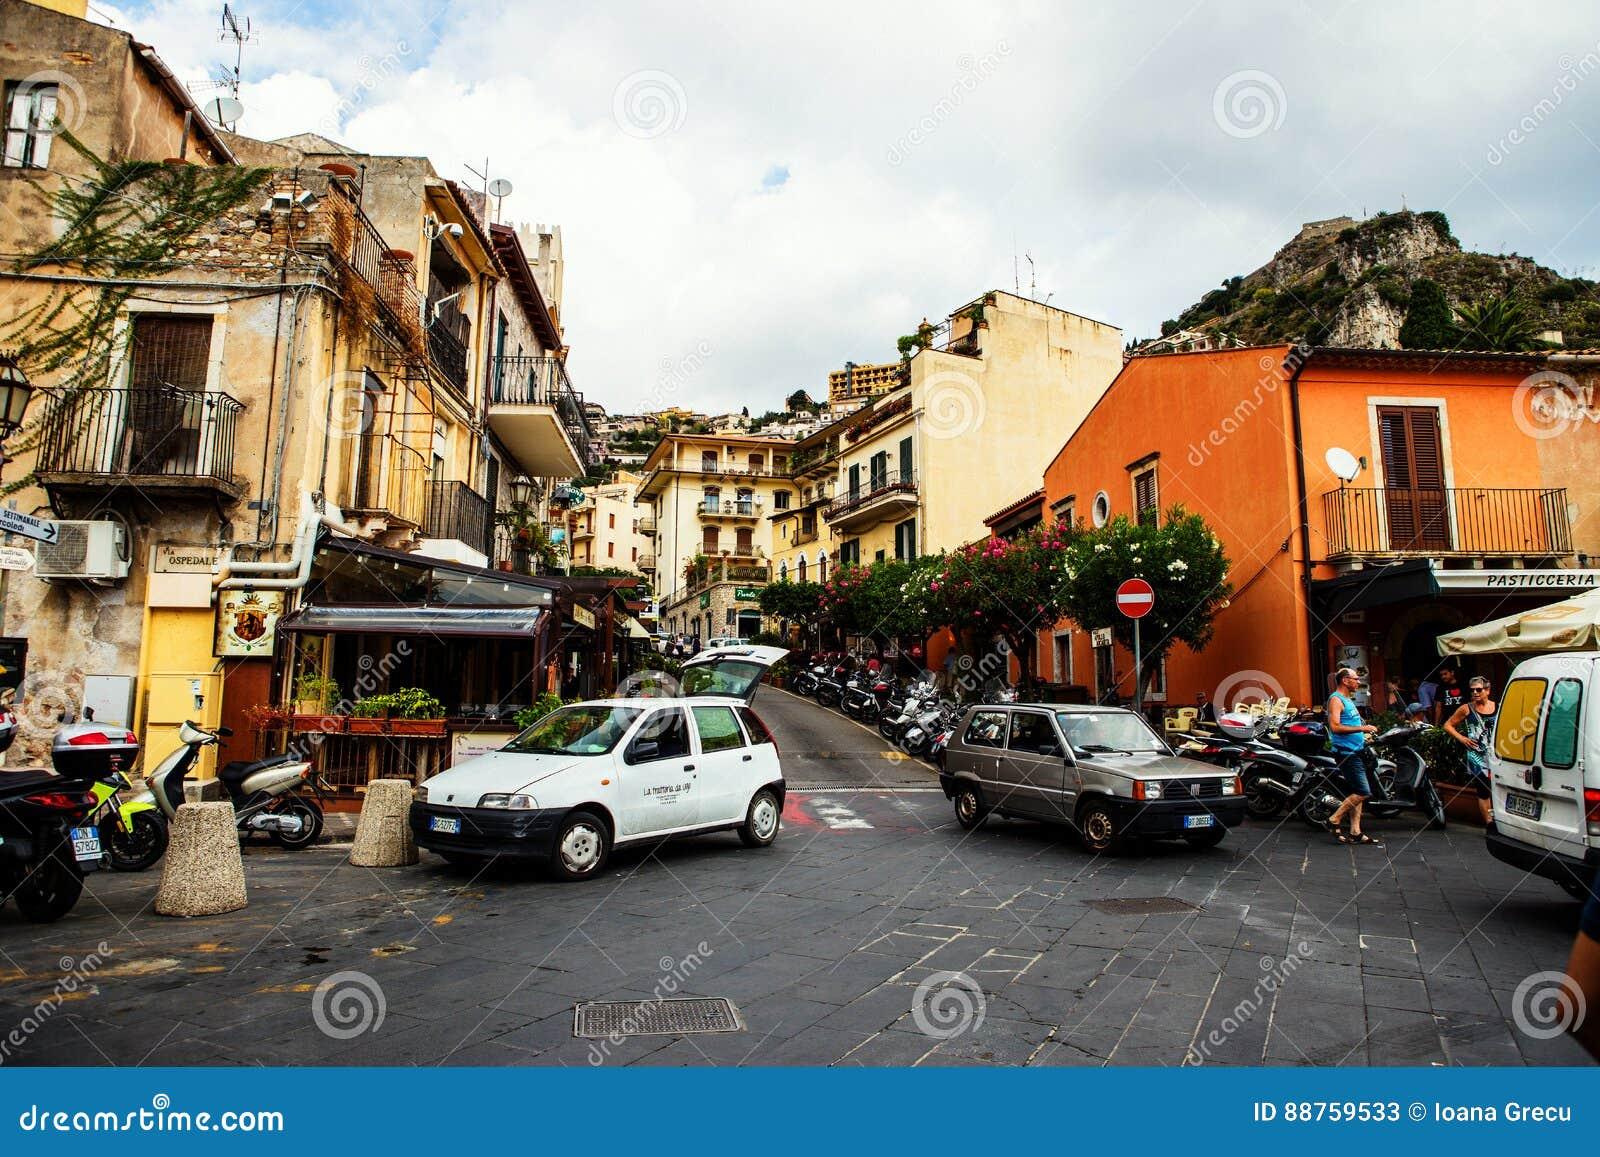 Taormina Entrance Street Bustling With Tourists Tourist